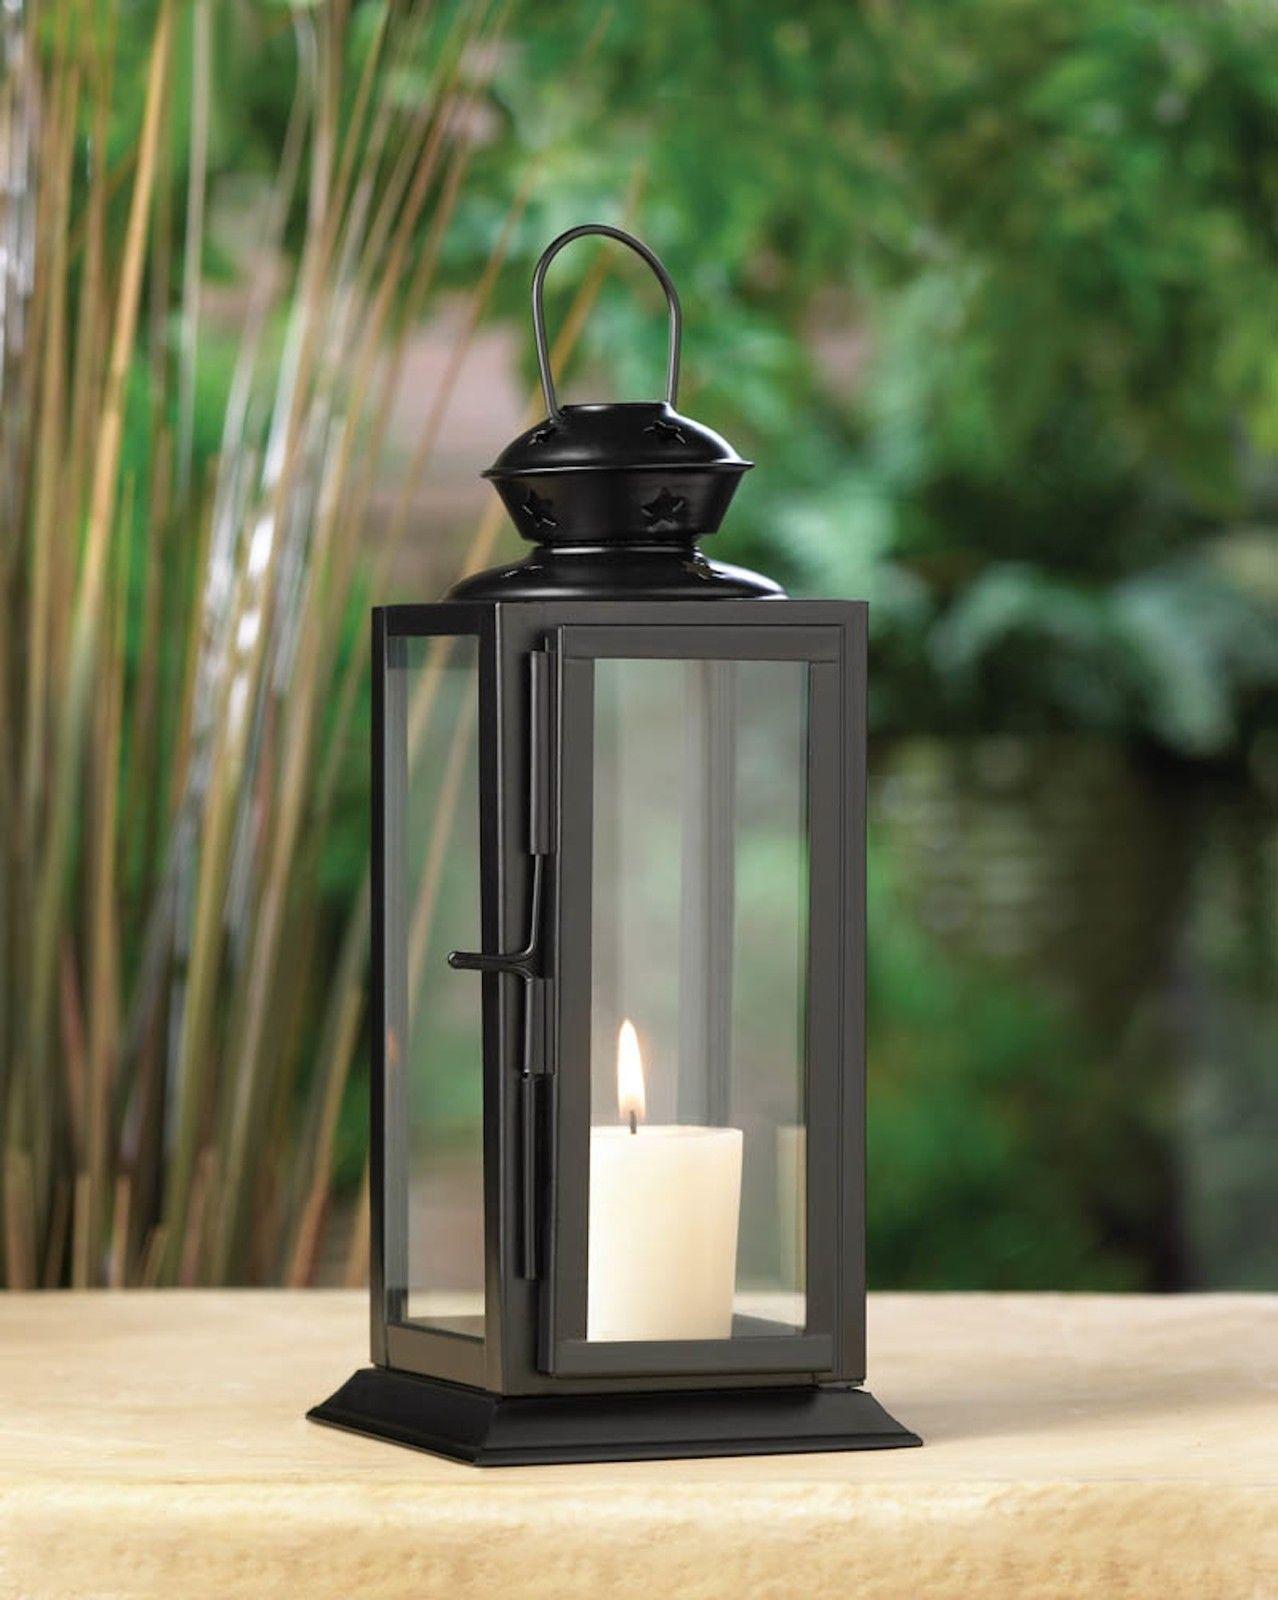 10 BLACK Lantern Candle Holder WEDDING Centerpieces